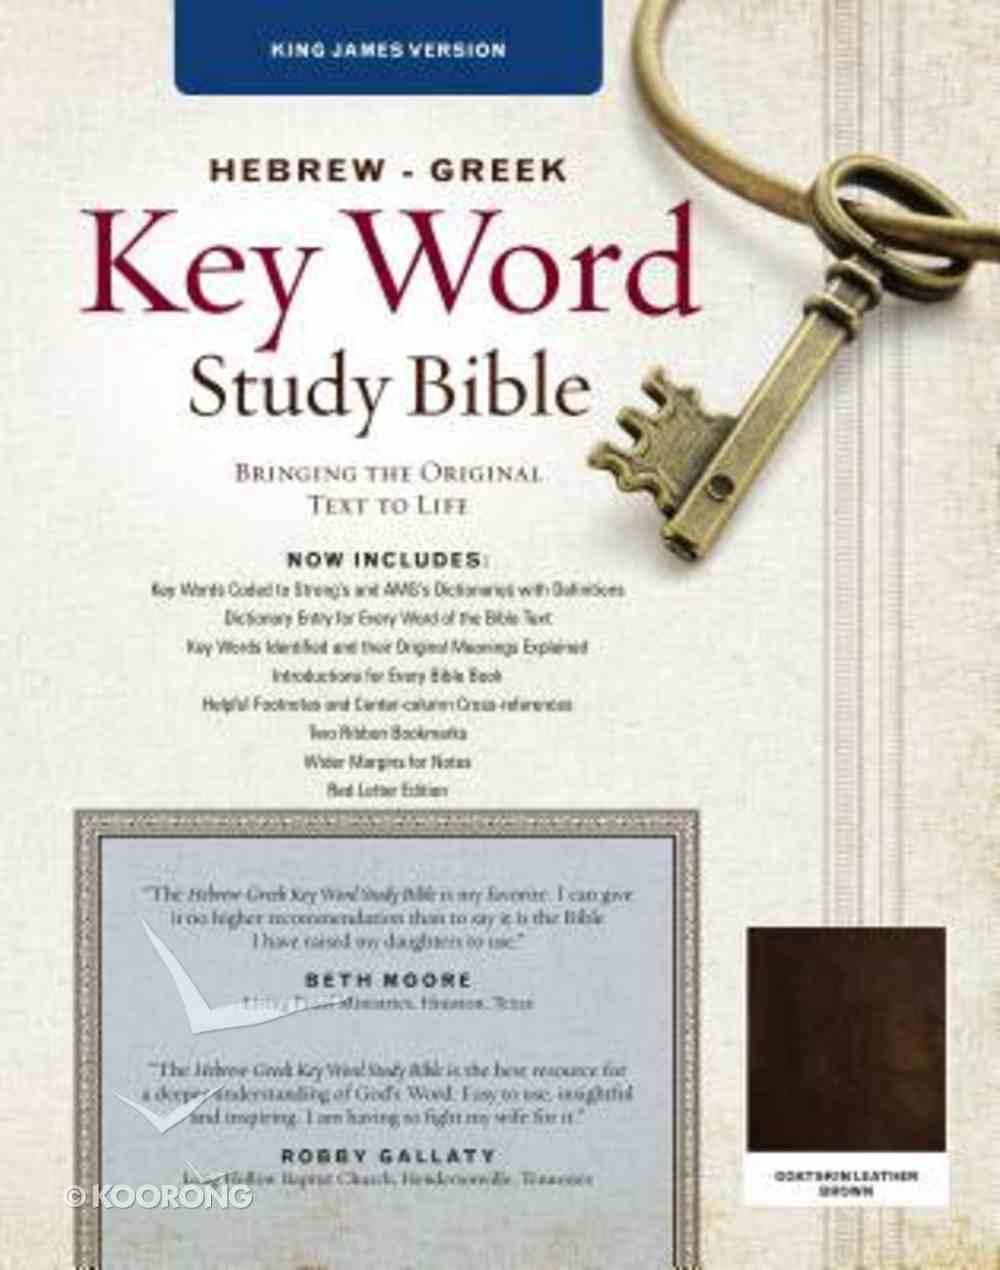 KJV Hebrew-Greek Key Word Study Bible Brown Genuine Leather